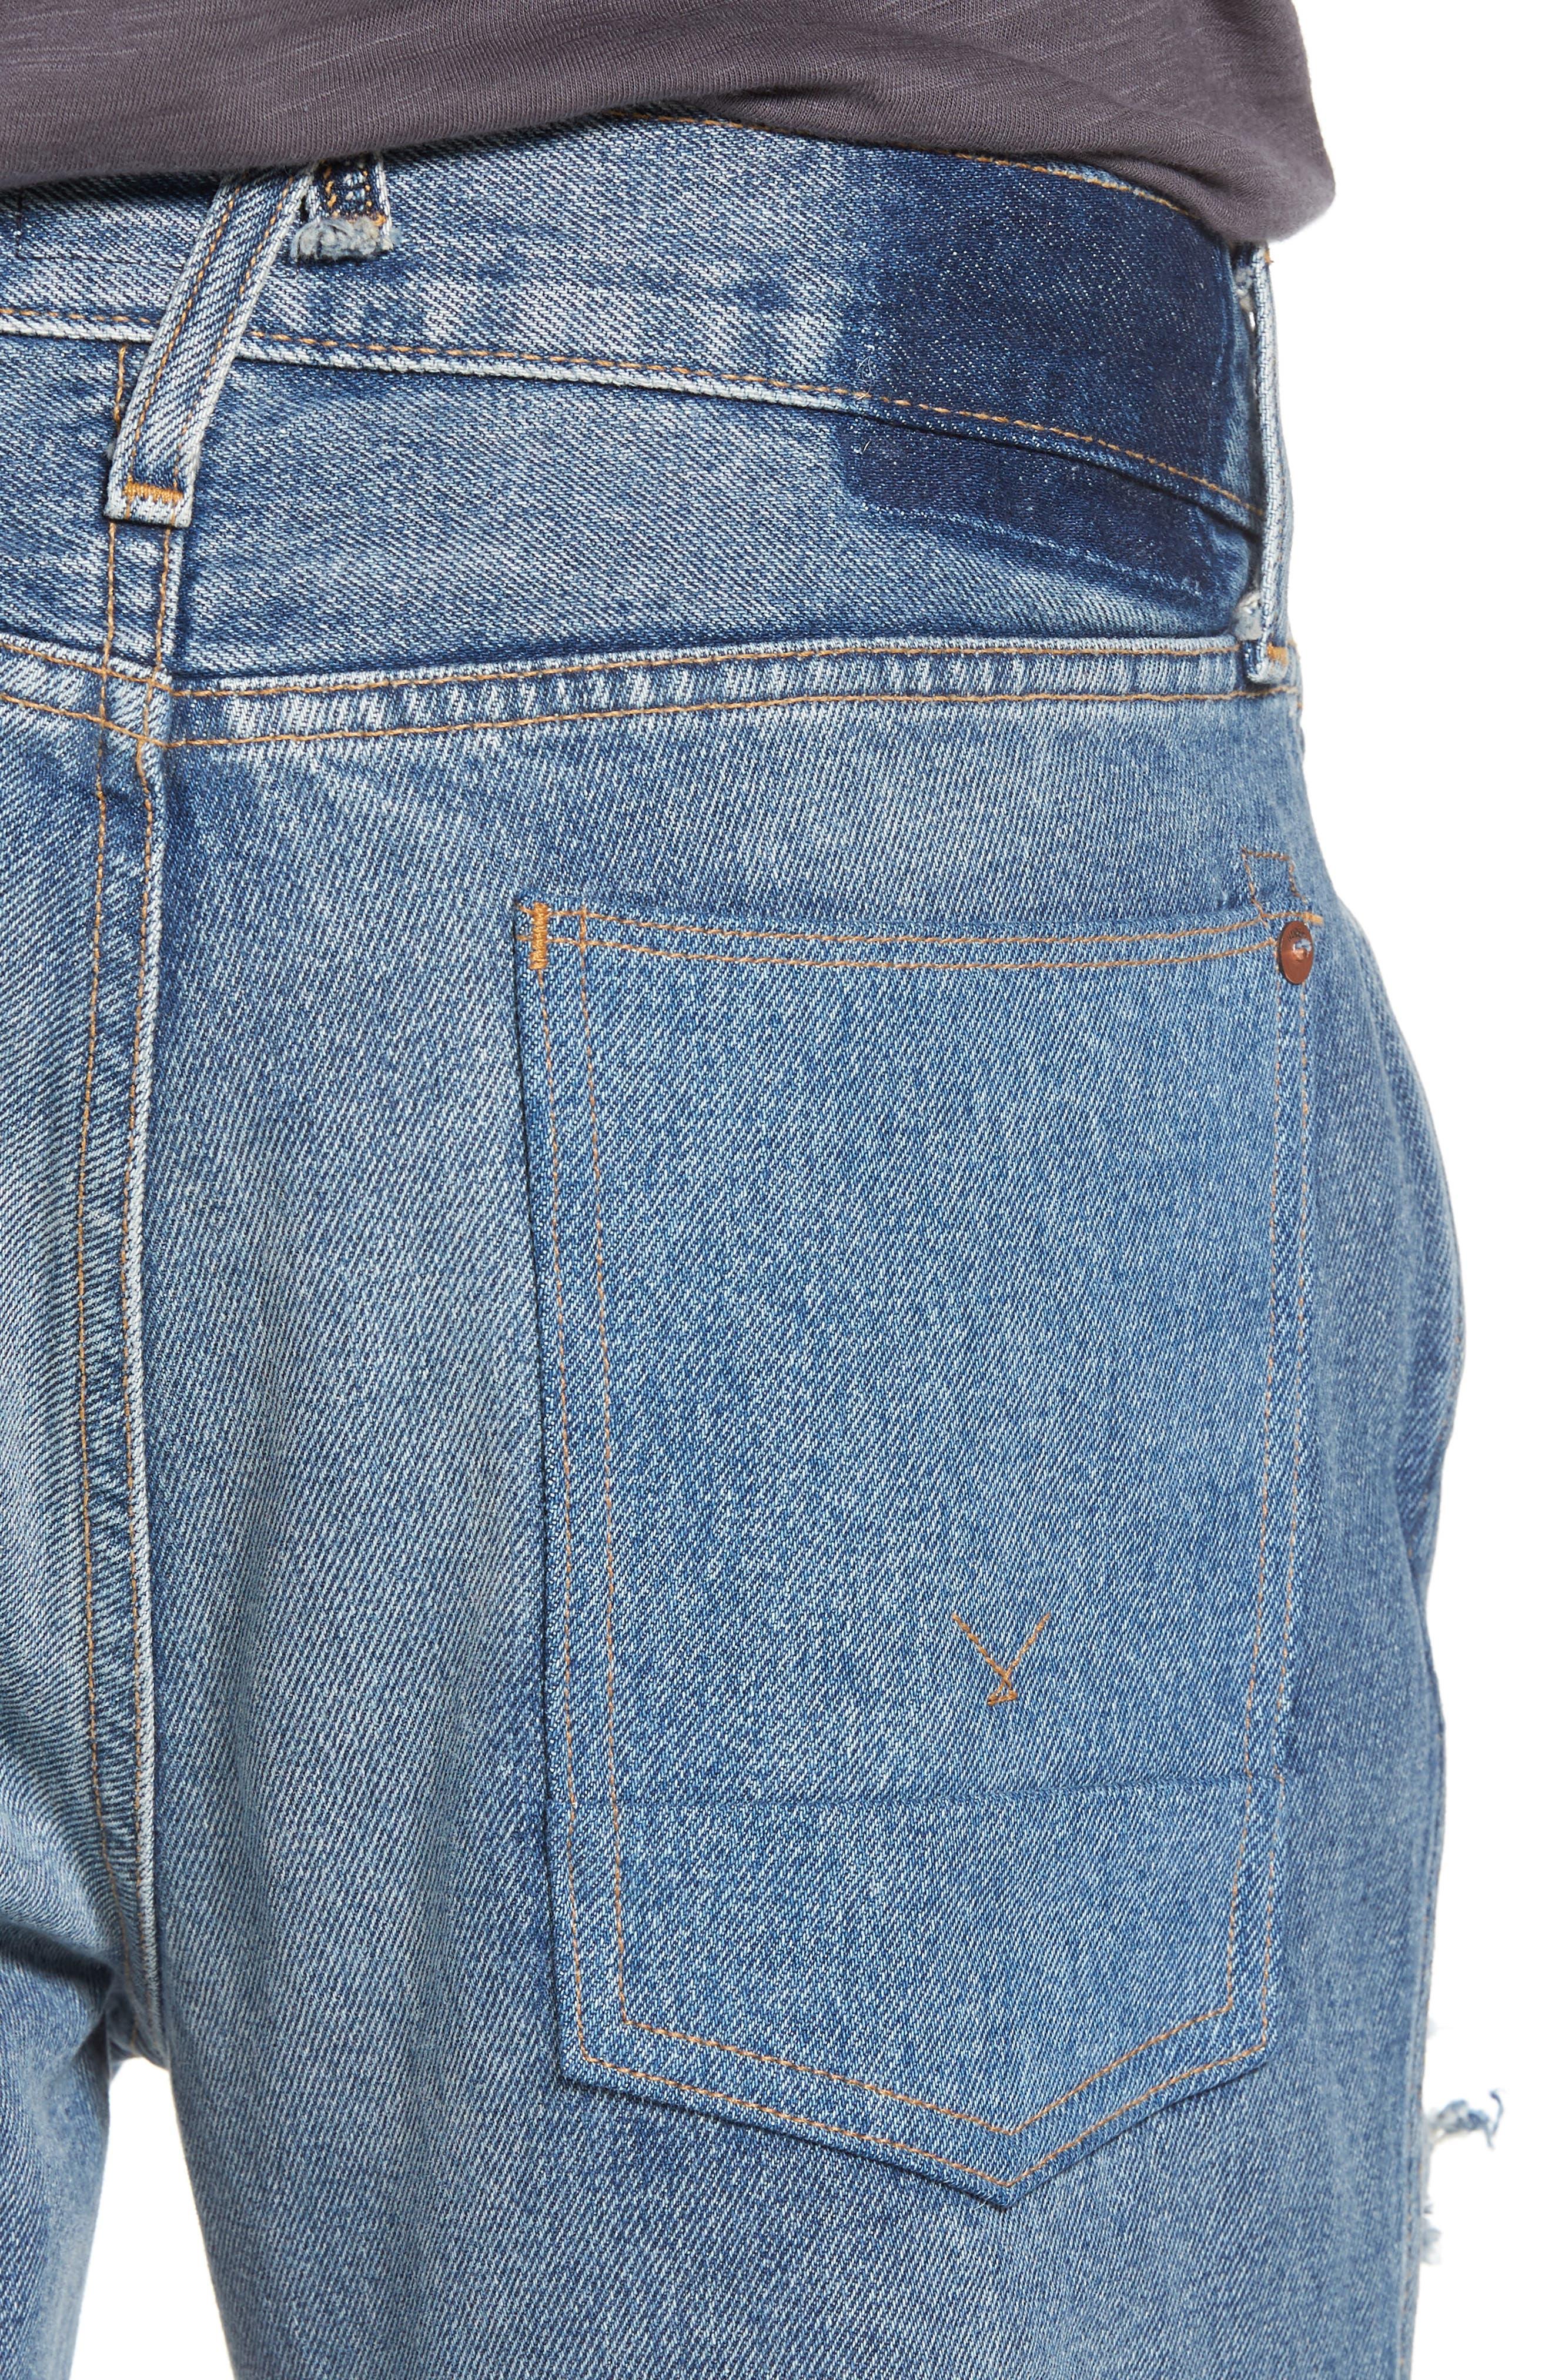 Dixon Straight Leg Jeans,                             Alternate thumbnail 4, color,                             IRON HEAD